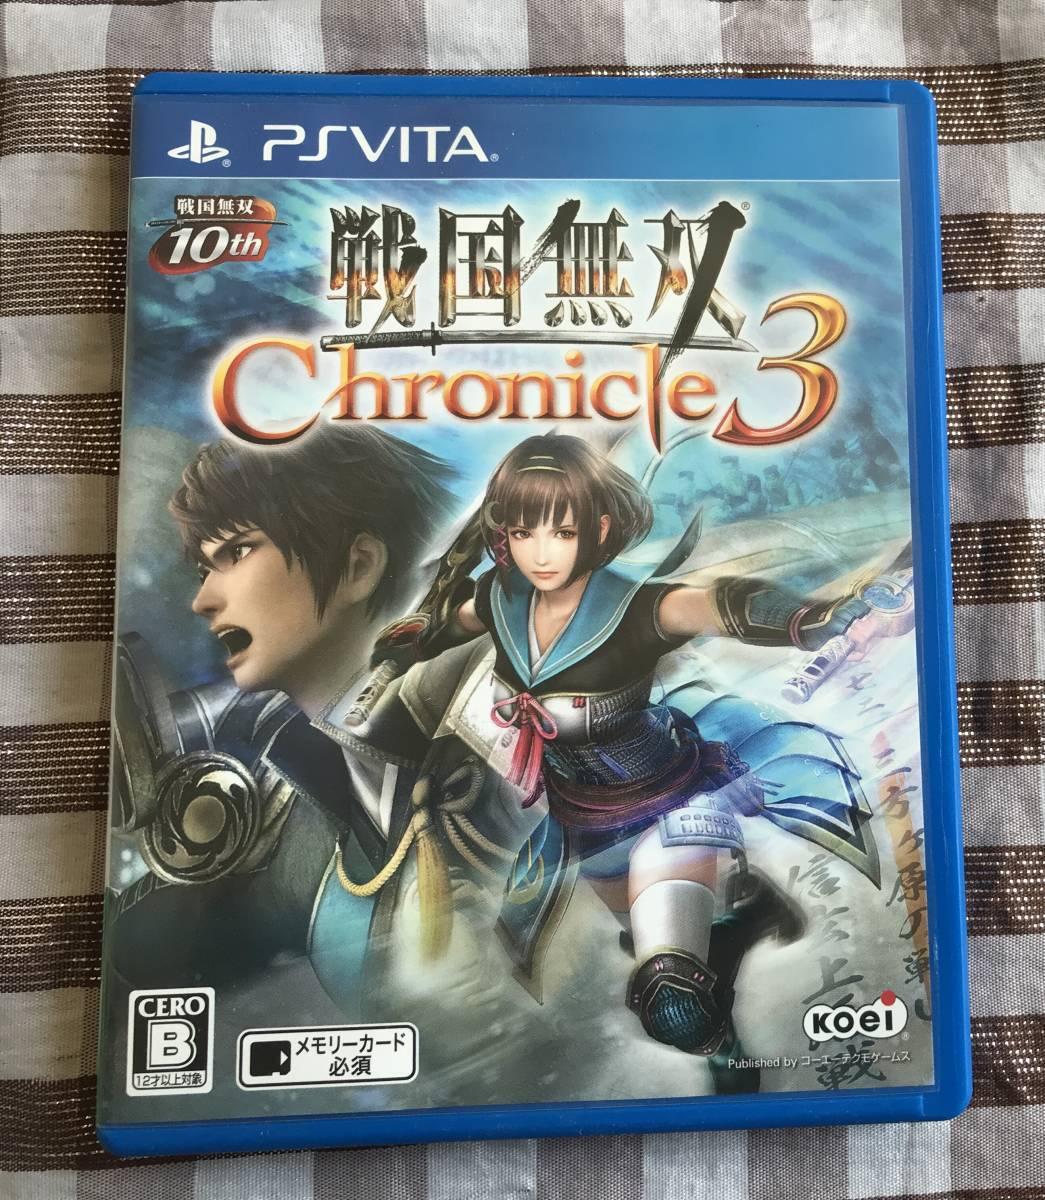 3DS PS VITA 戦国無双Chronicle 2nd クロニクル3 プレミアムBOX 攻略本セット ガイドブック